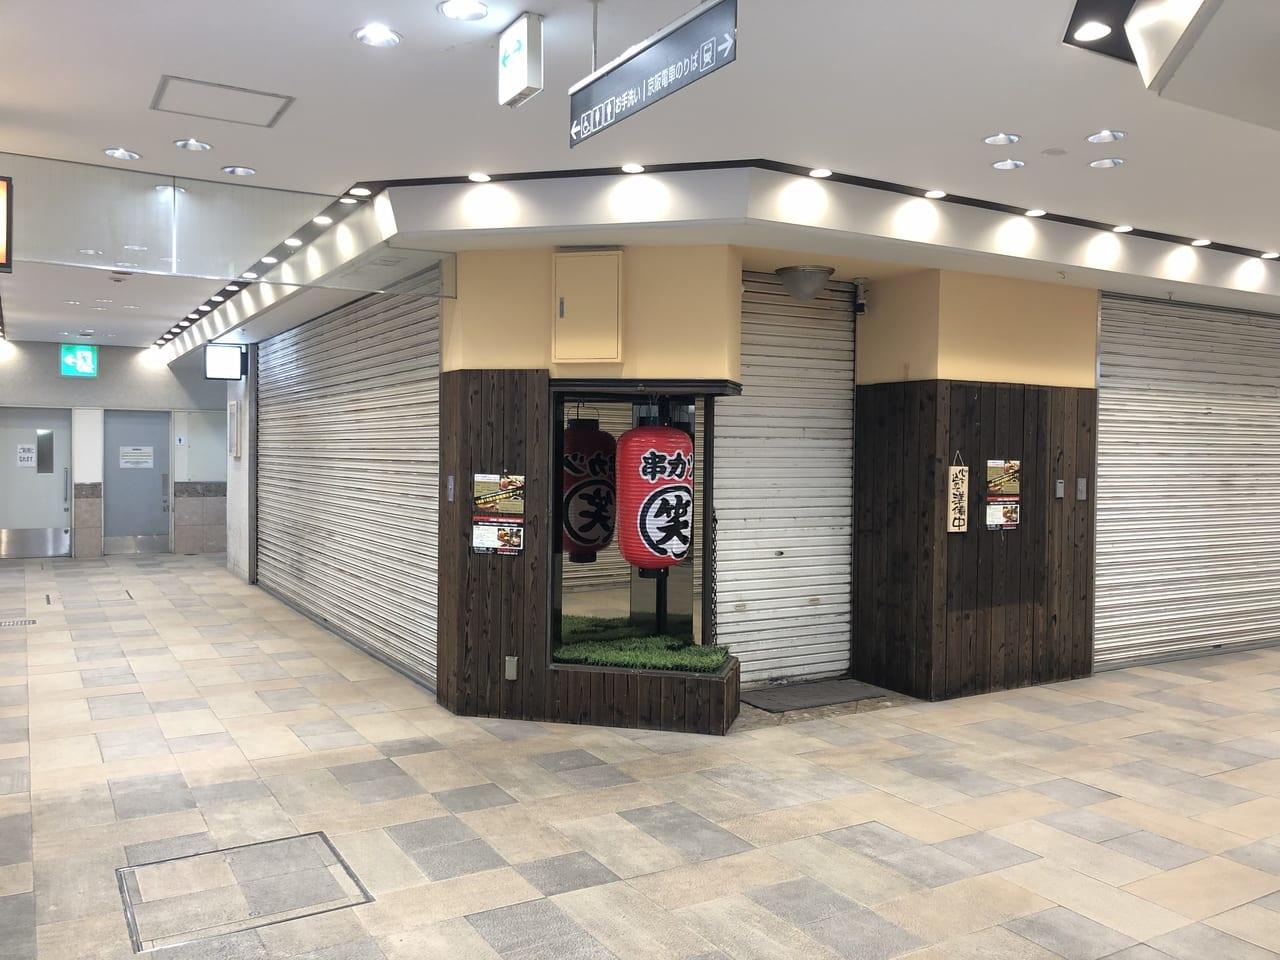 串カツ居酒屋 笑〜warai〜